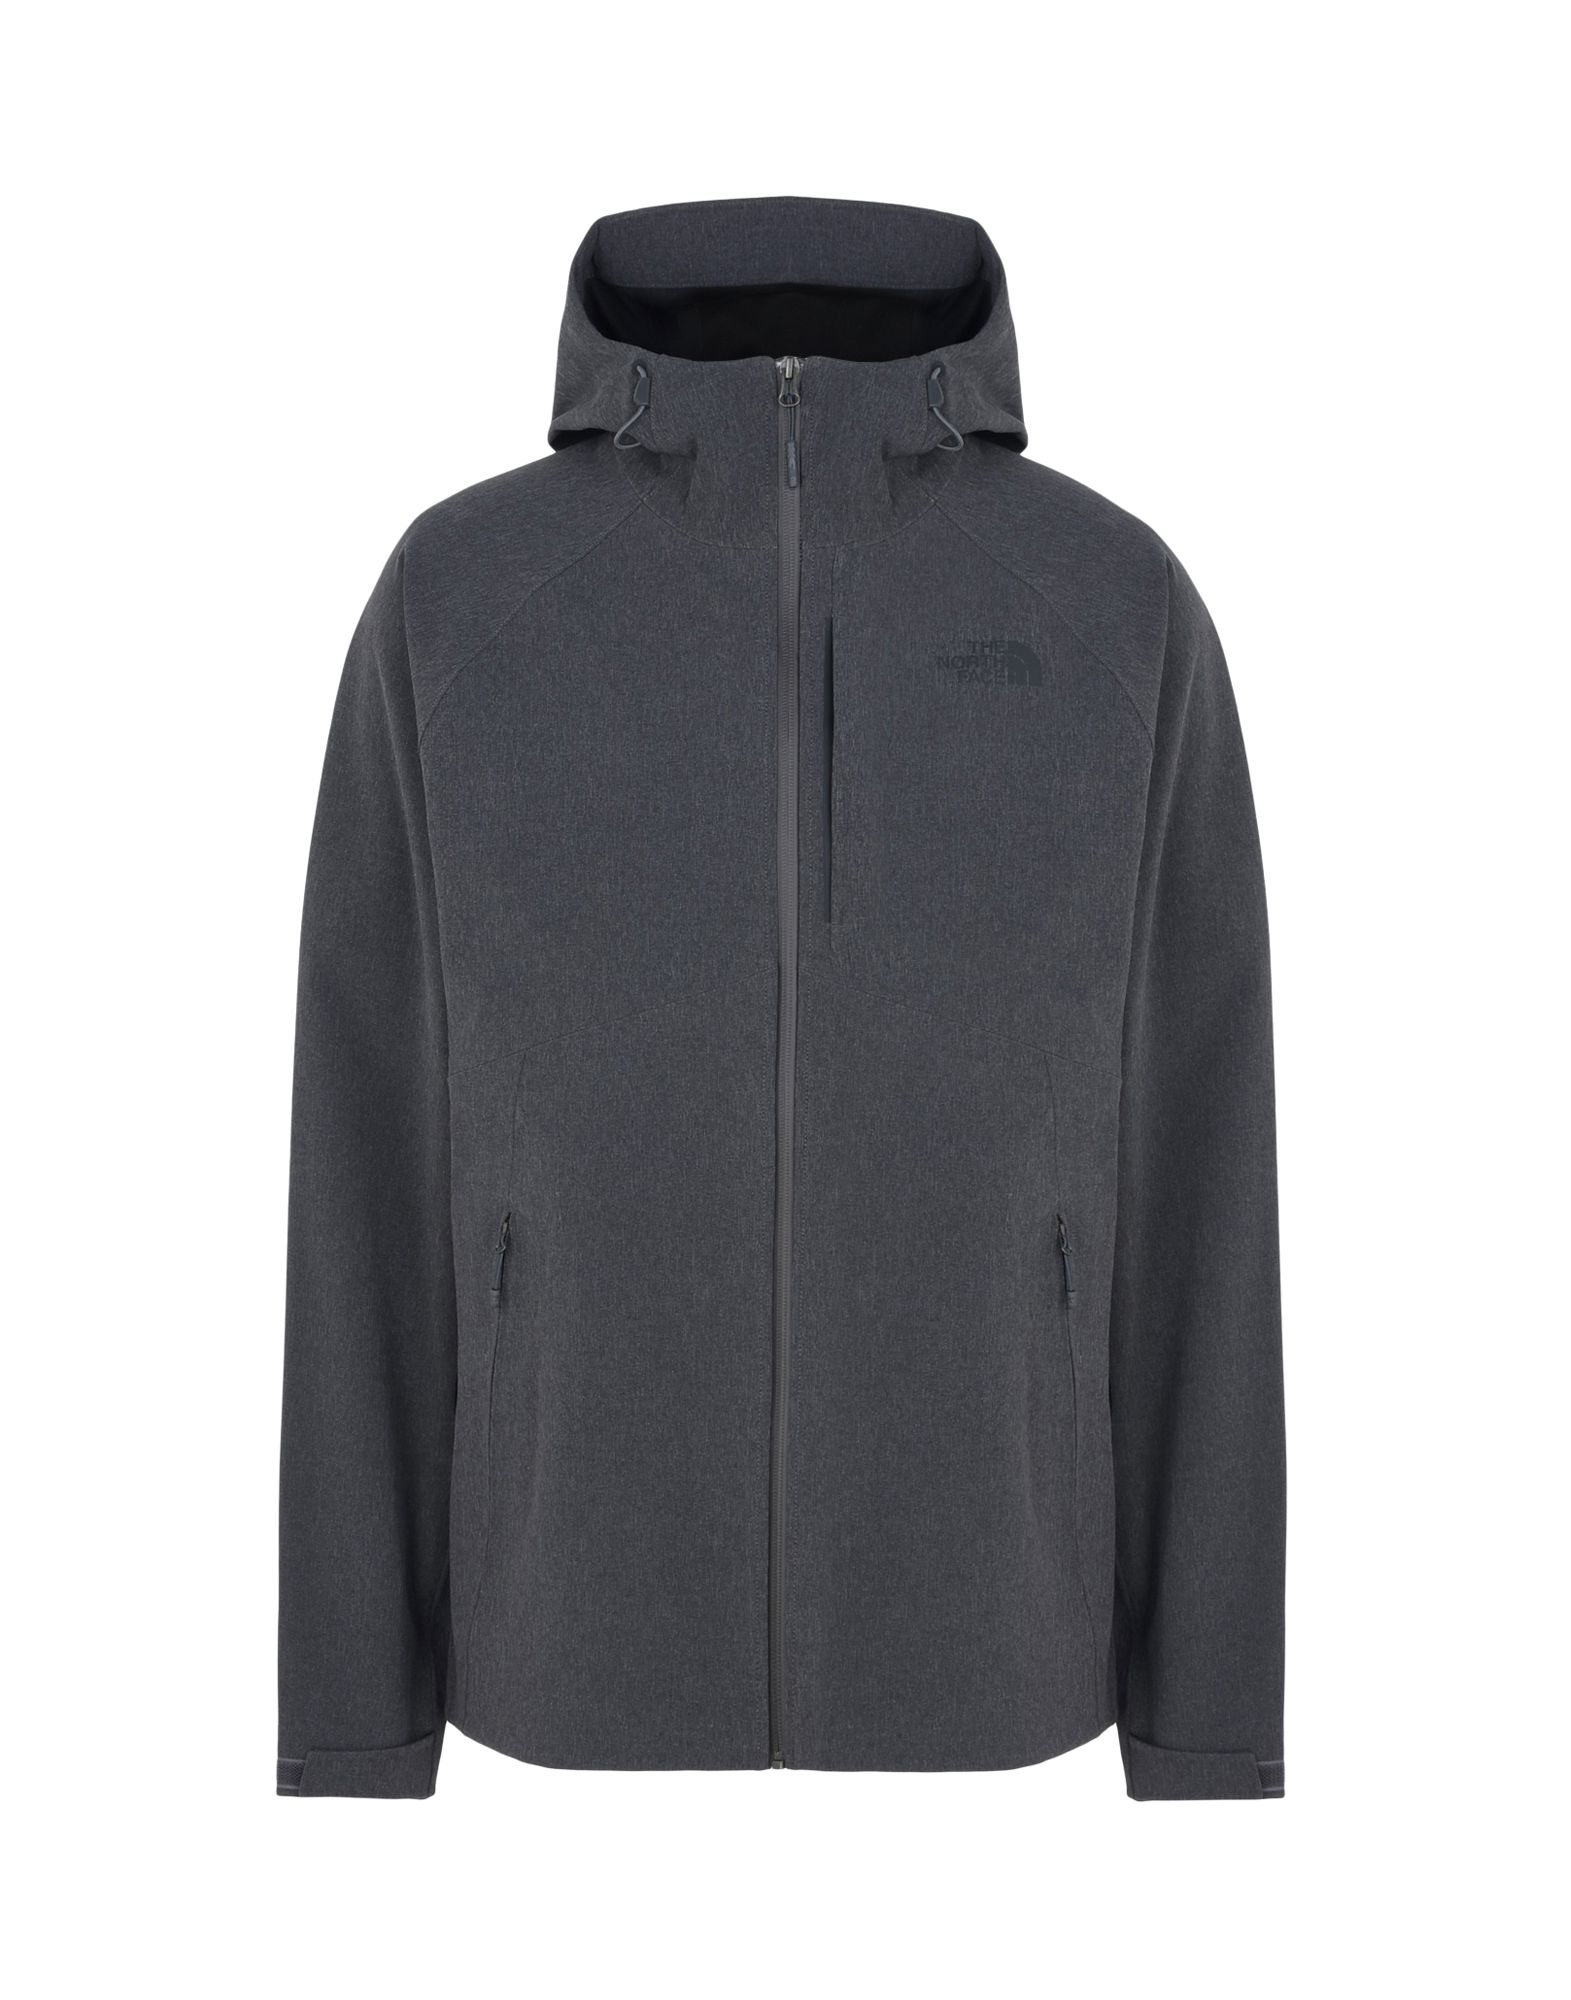 Giubbotto The North Face M Apex Flex Shell Gtx Jacket 3L Goretex Waterproof Breathable - Uomo - Acquista online su